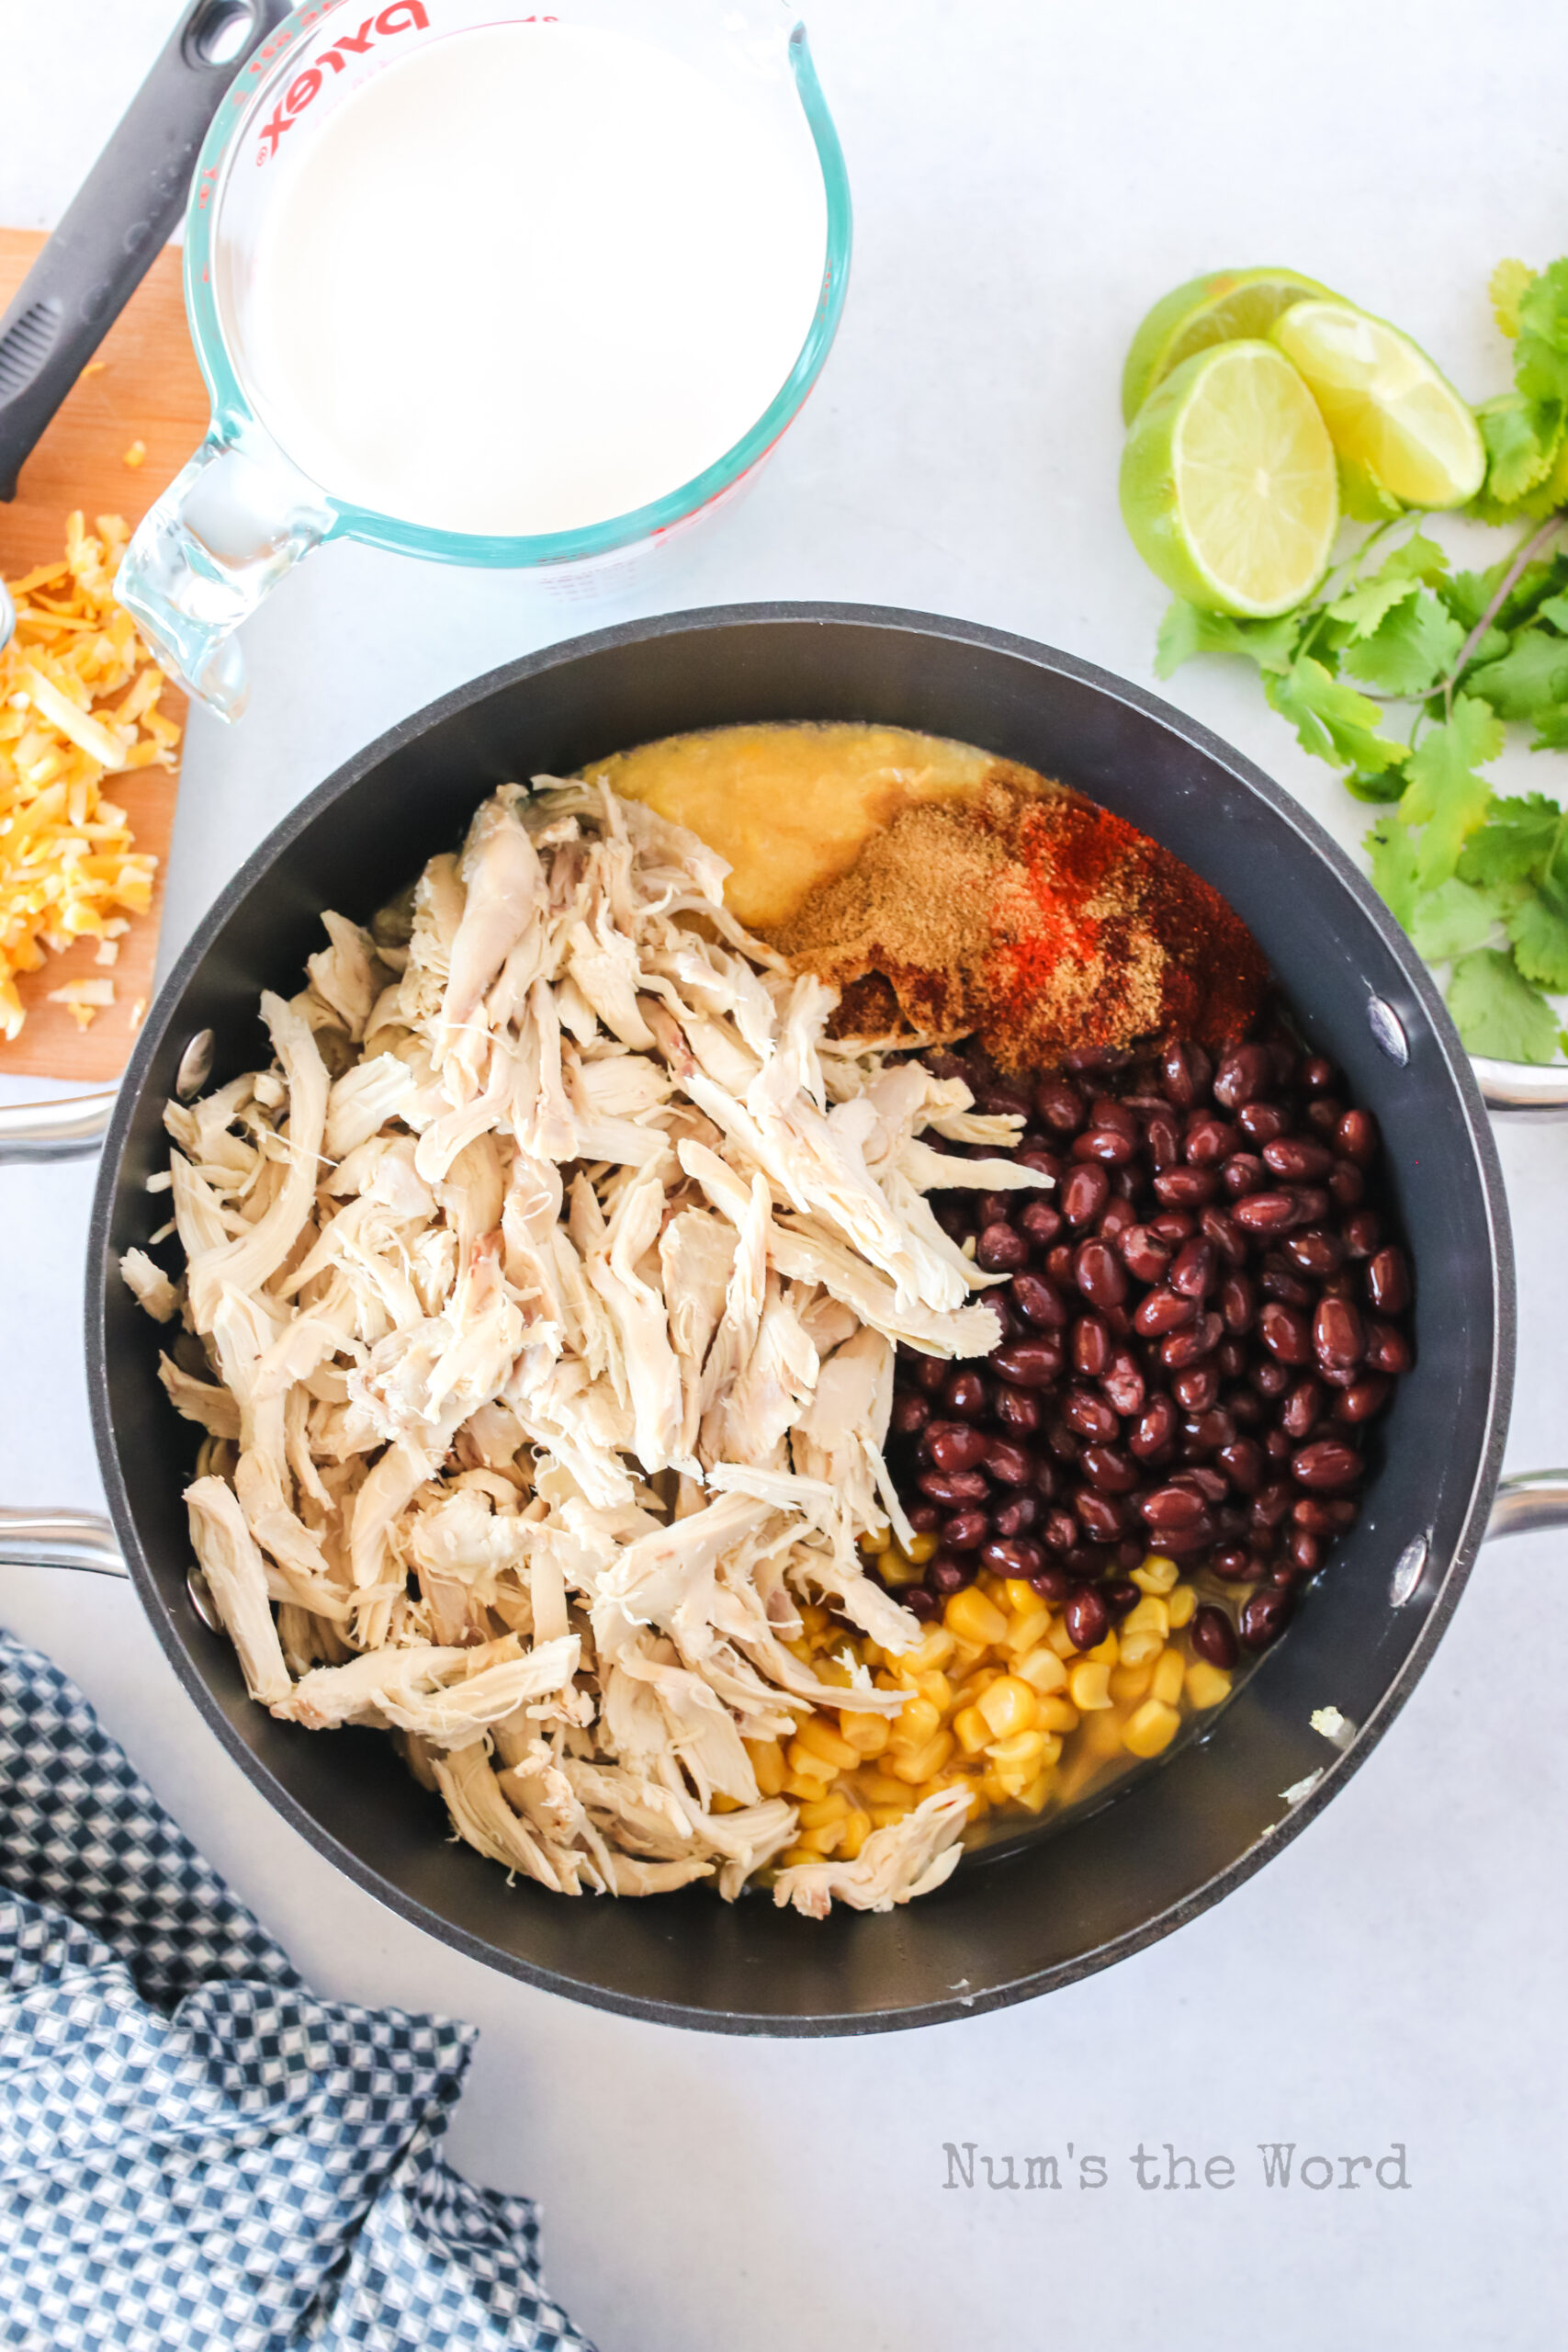 chicken, garlic, broth, corn, cream corn, black beas, chipotel powder, paprika, cumin all added to pan.